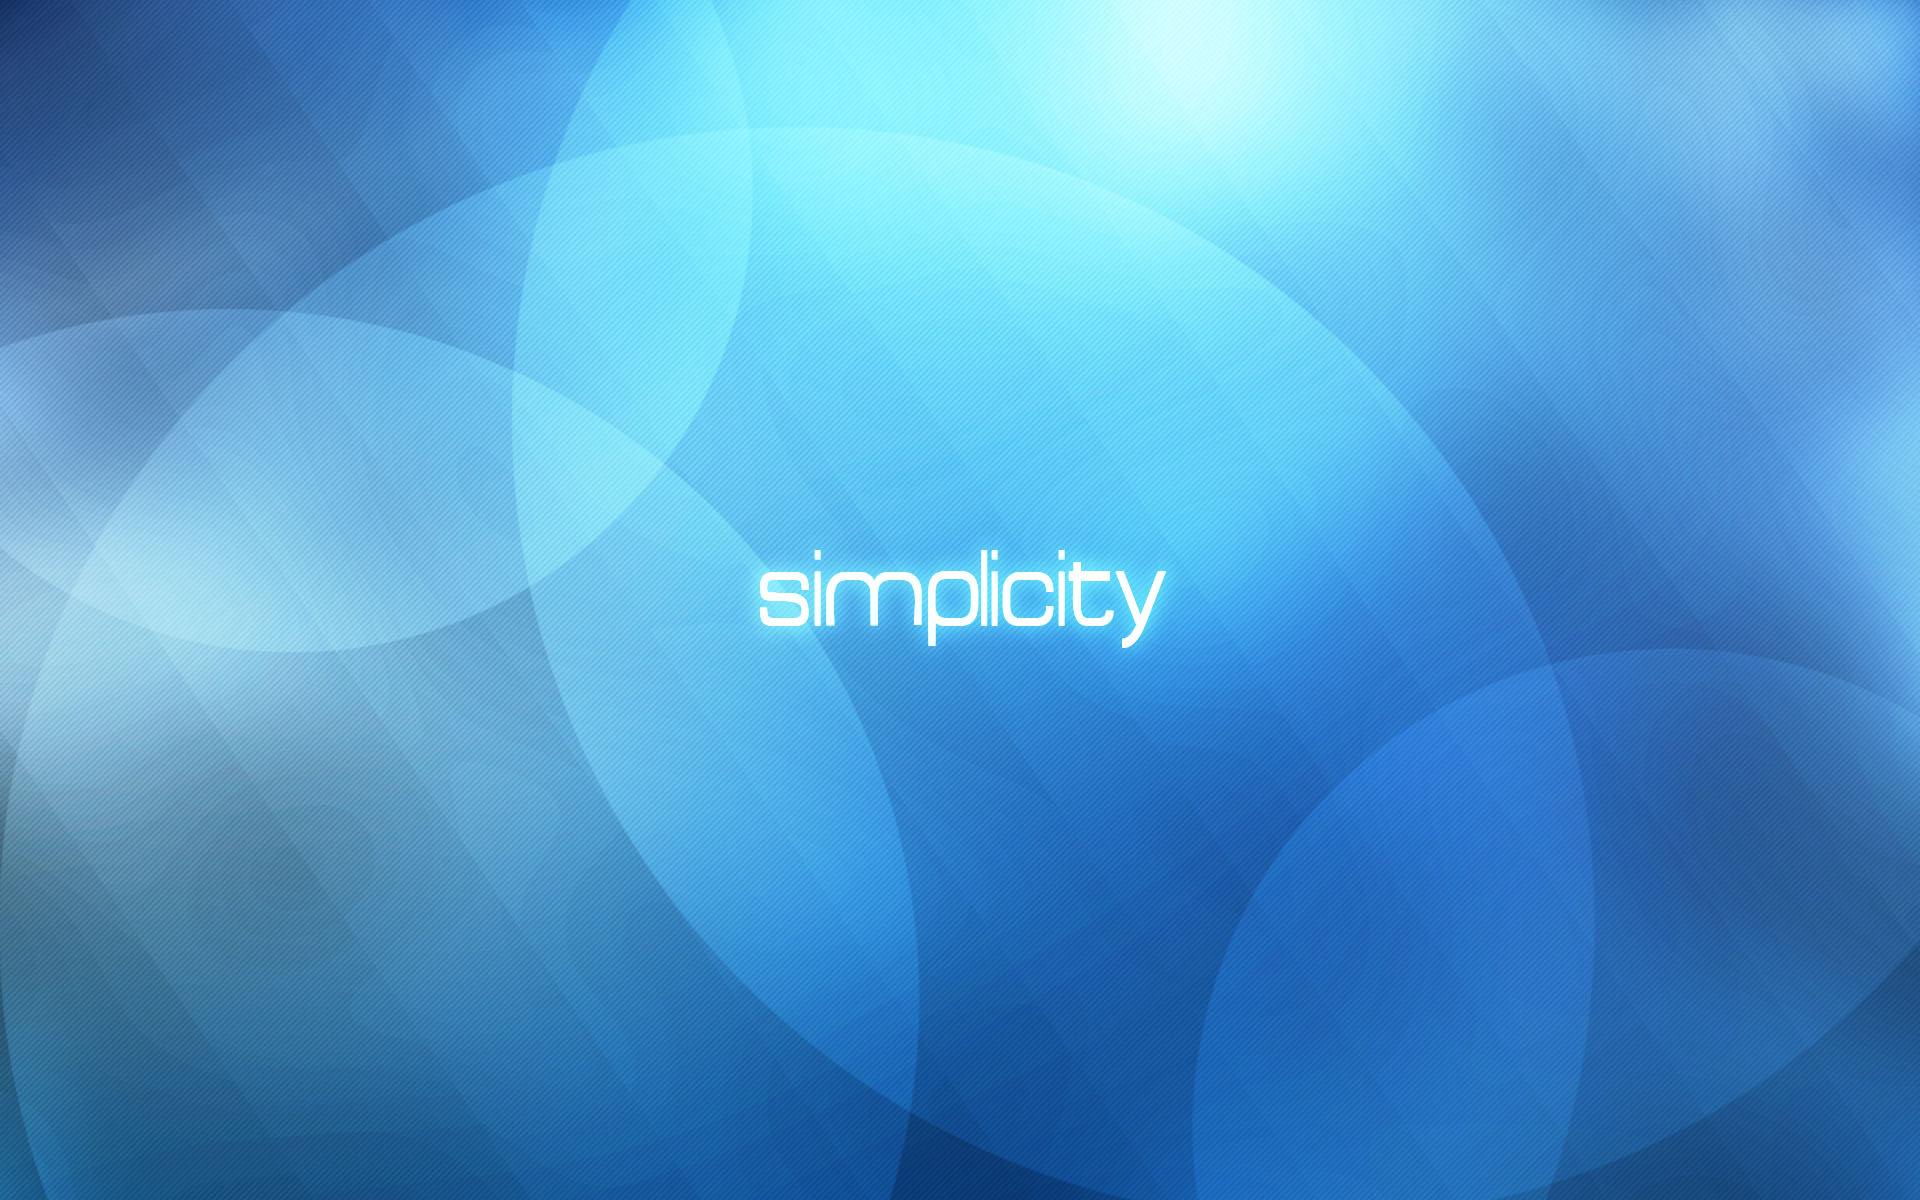 Simplicity wallpaper - 228464